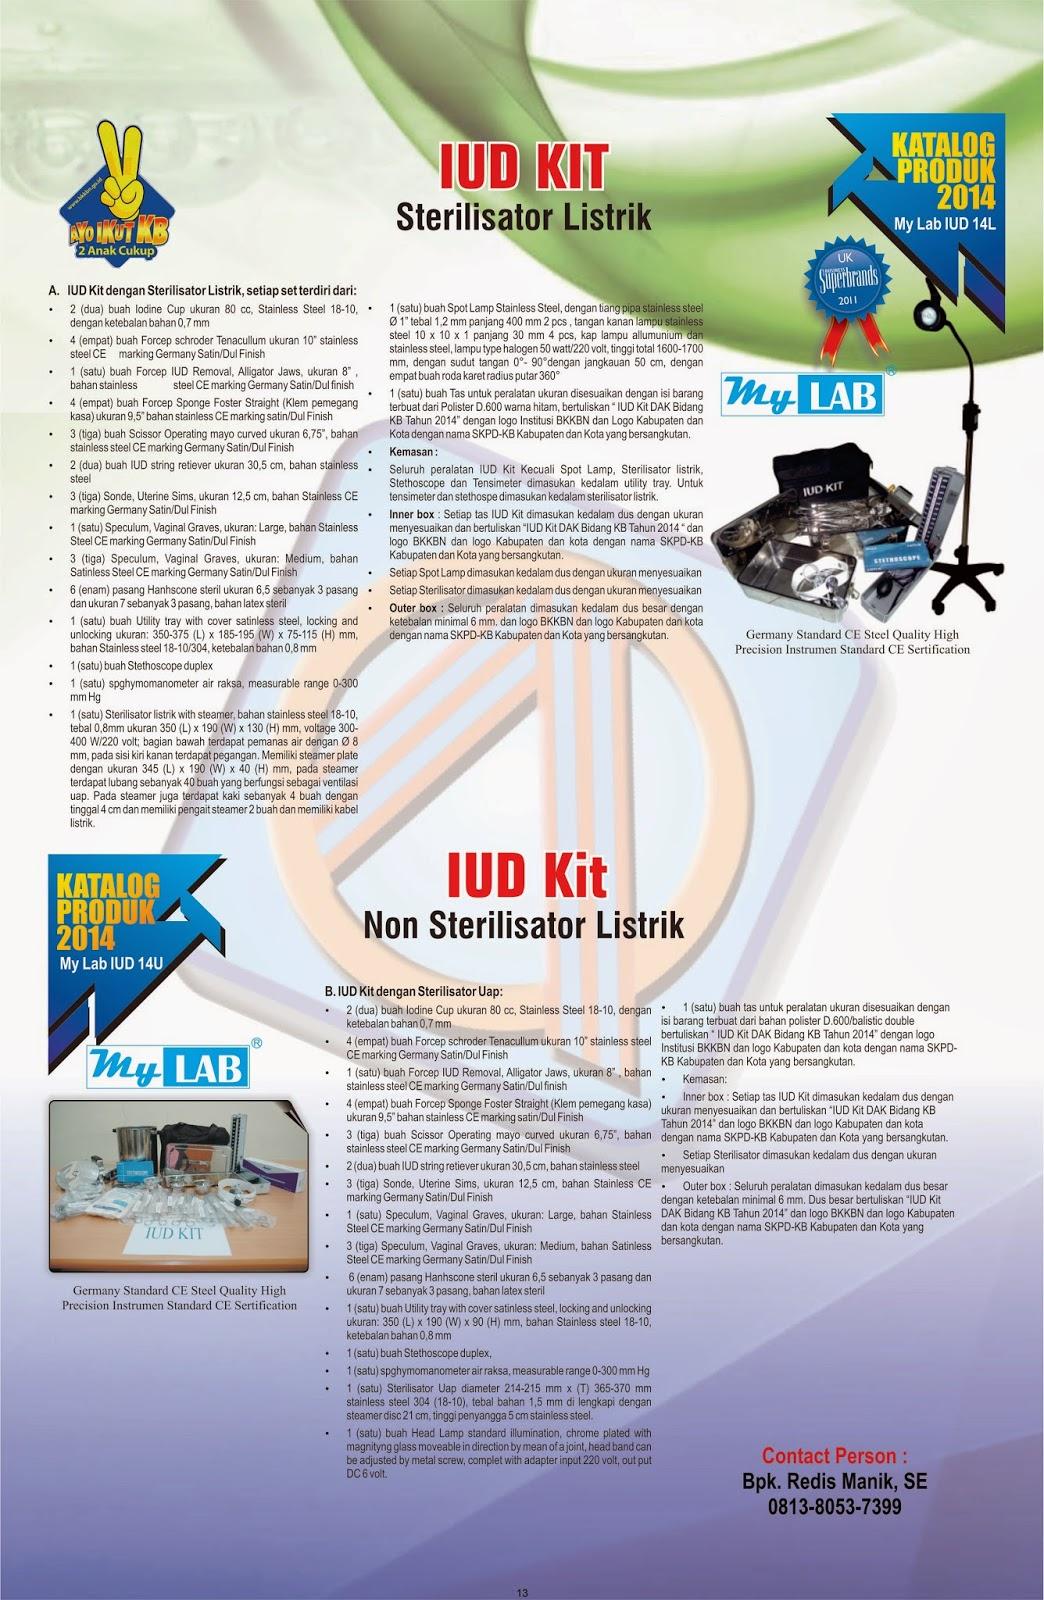 UD Kit BKKbN 2014 - PENJUAL ALAT KESEHATAN IUD KIT DAK BKKbN 2014~Rab iud kit bk kb n 2014